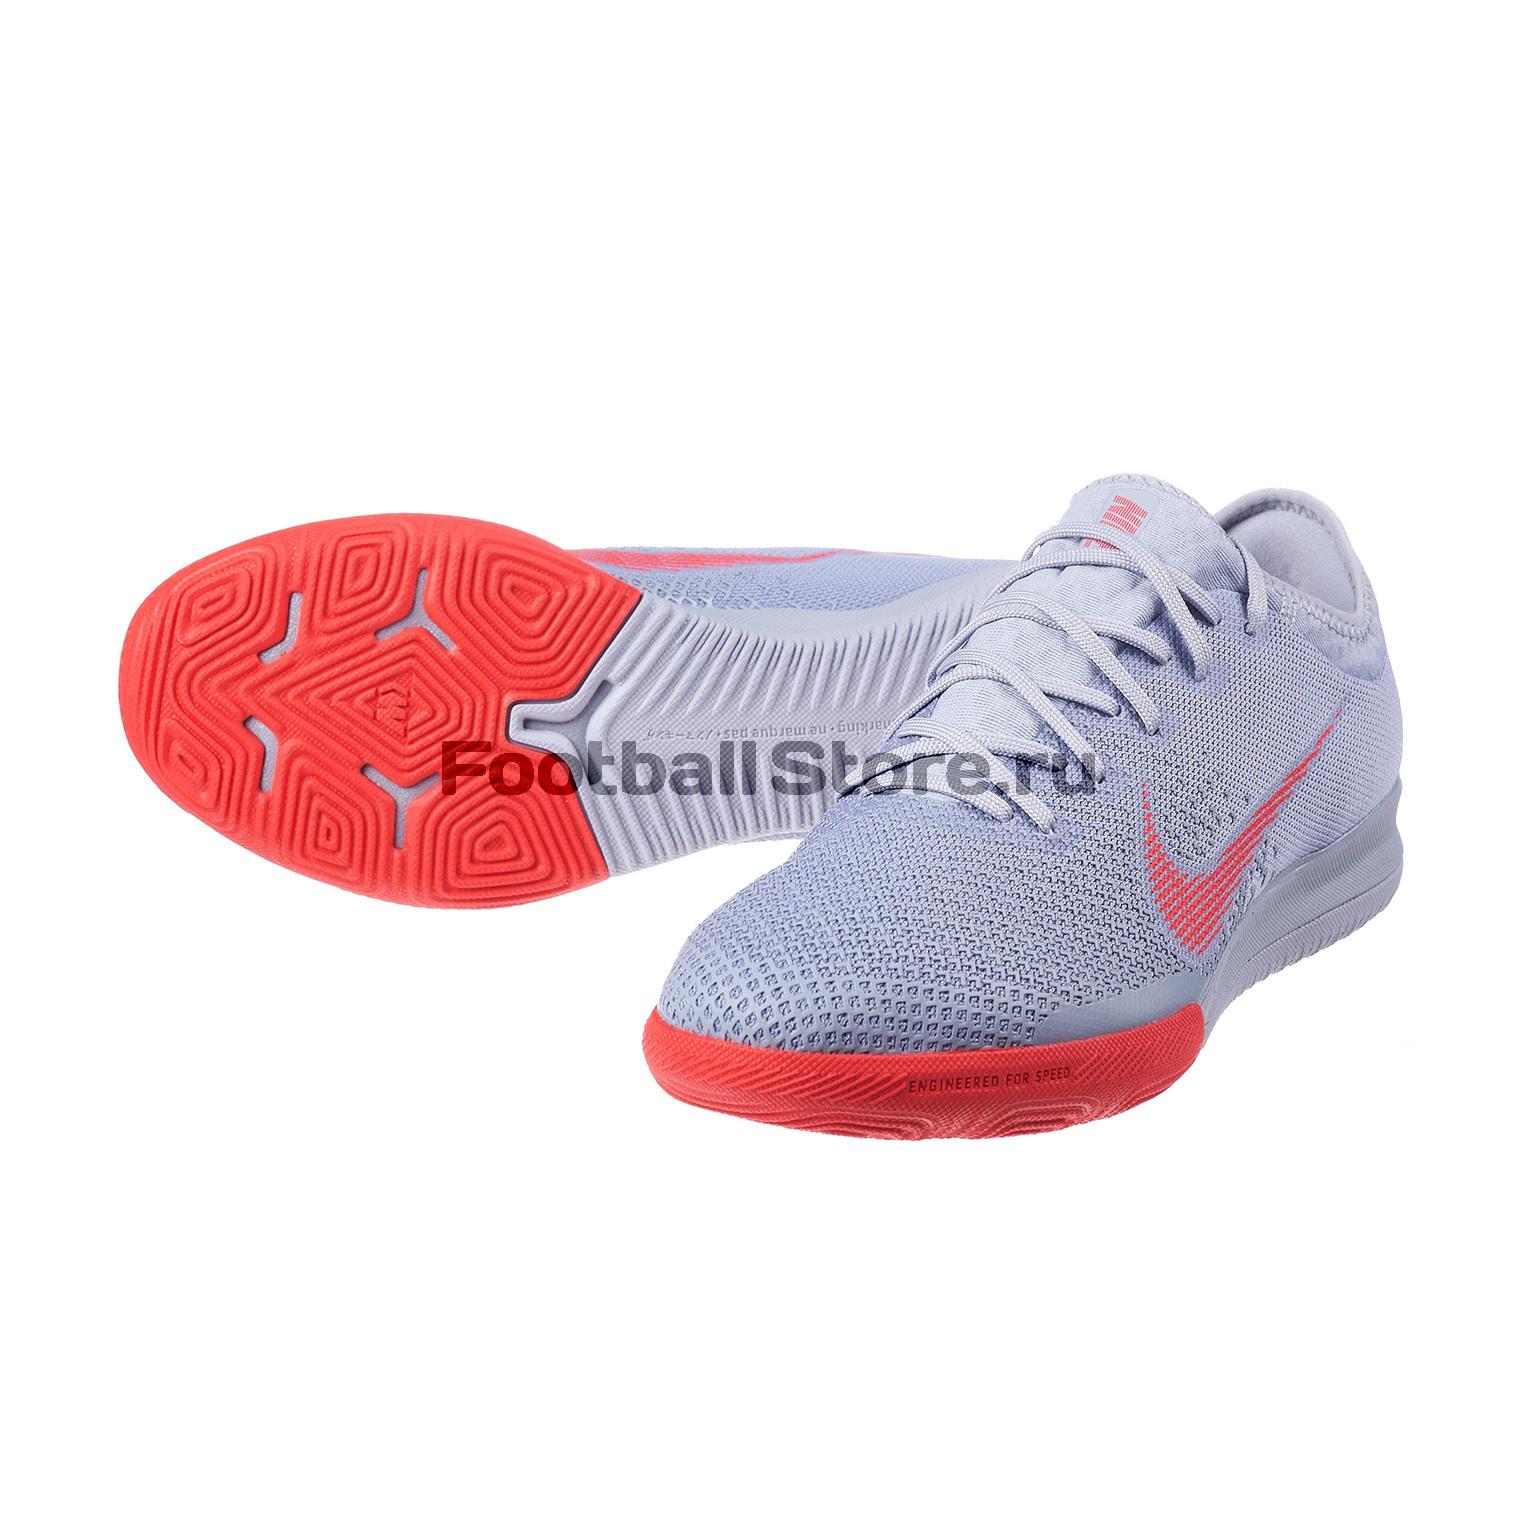 Обувь для зала Nike VaporX 12 Pro IC AH7387-060 шапки и кепки для туризма и кемпинга nike 666412 584169 410 010 688767 043 100 060